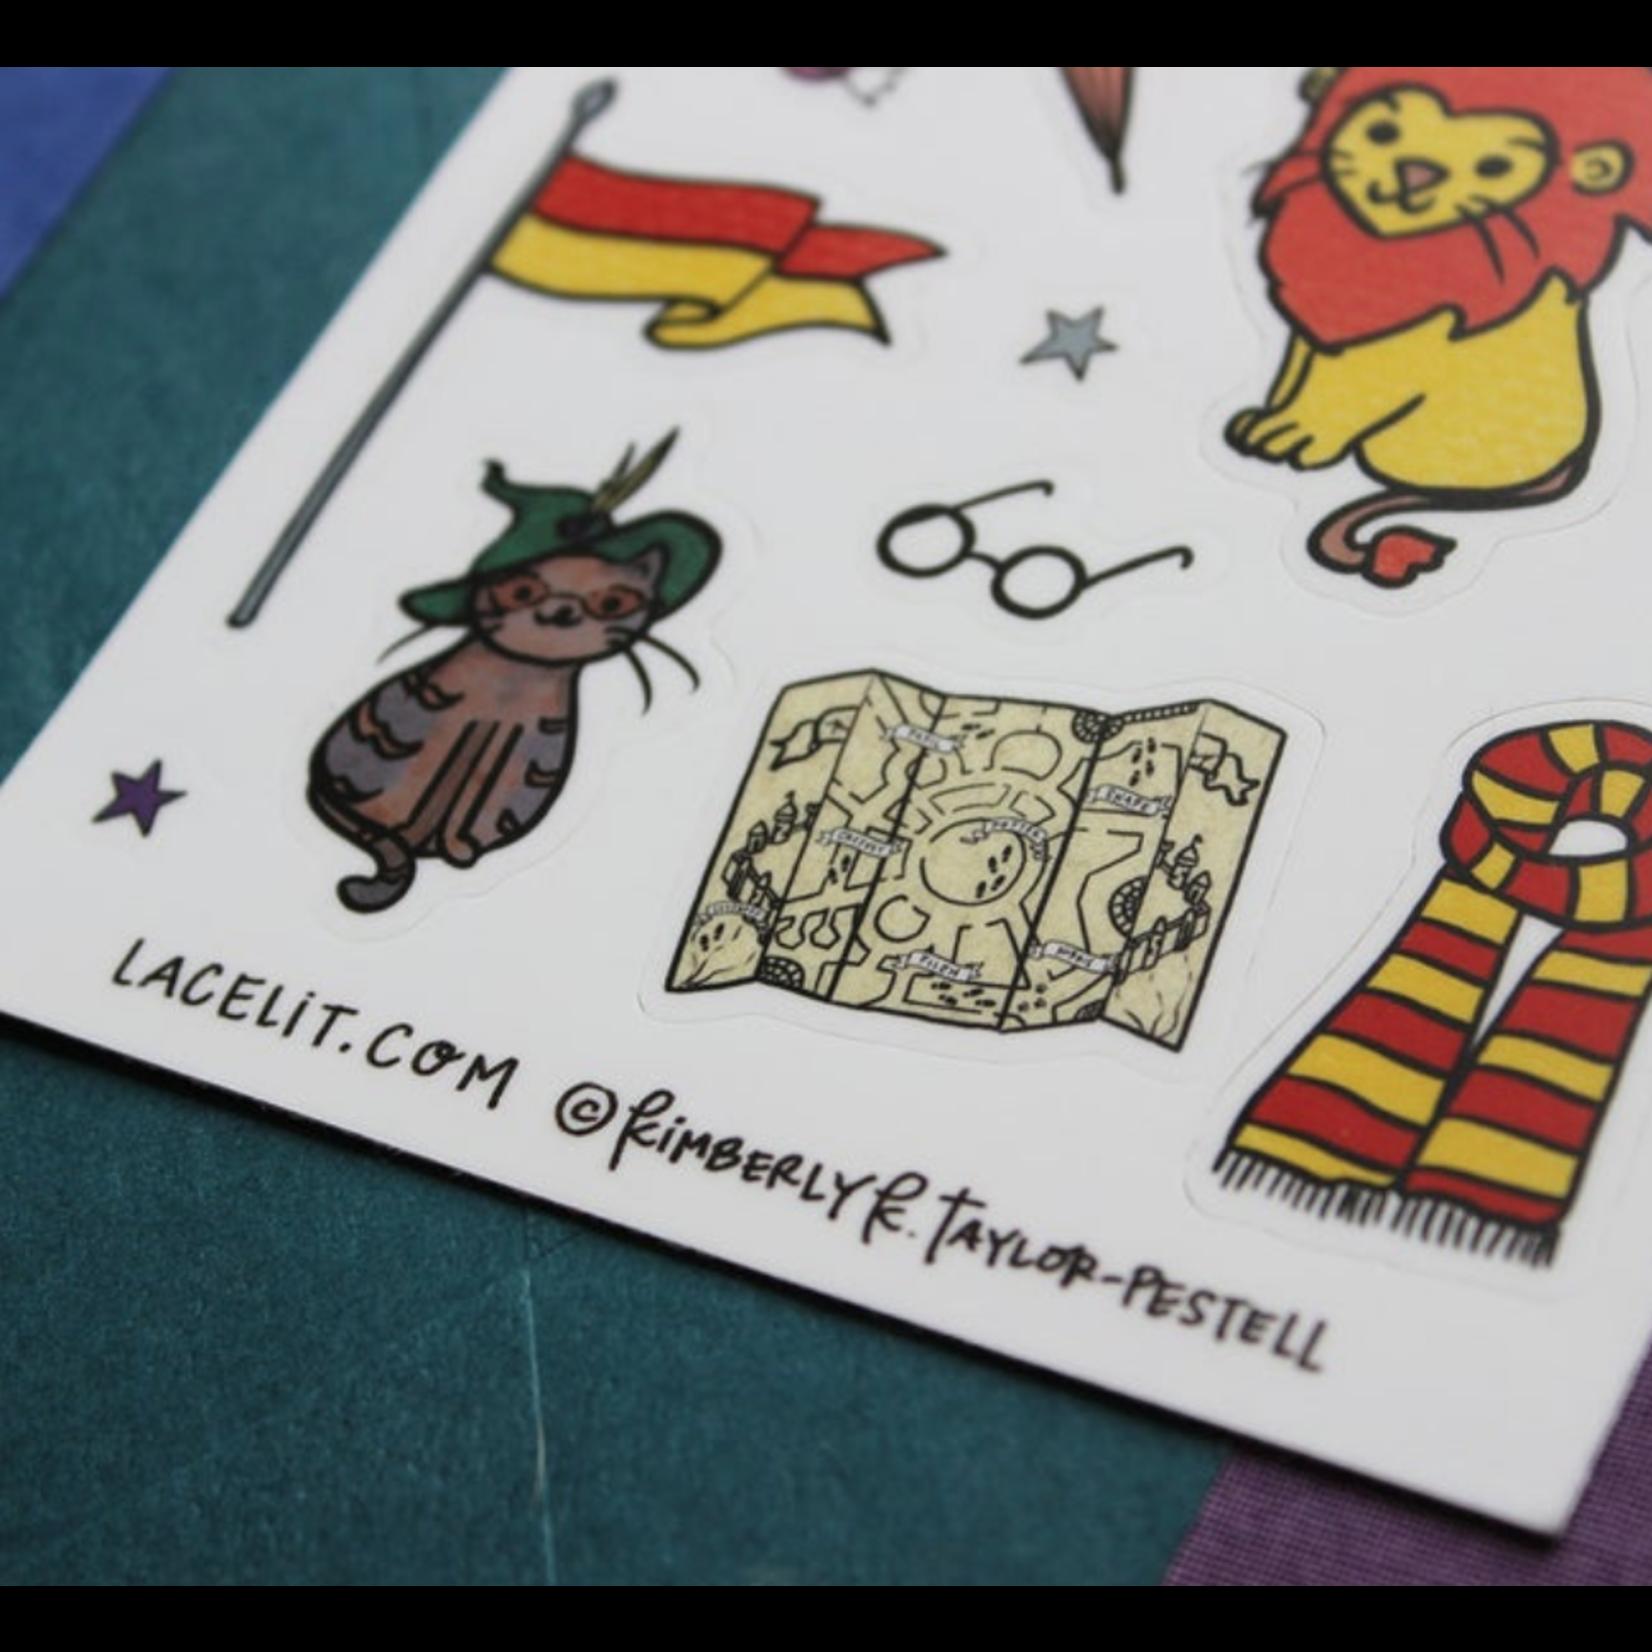 Lacelit (APO) Gryffinhouse Vinyl Sticker Sheet